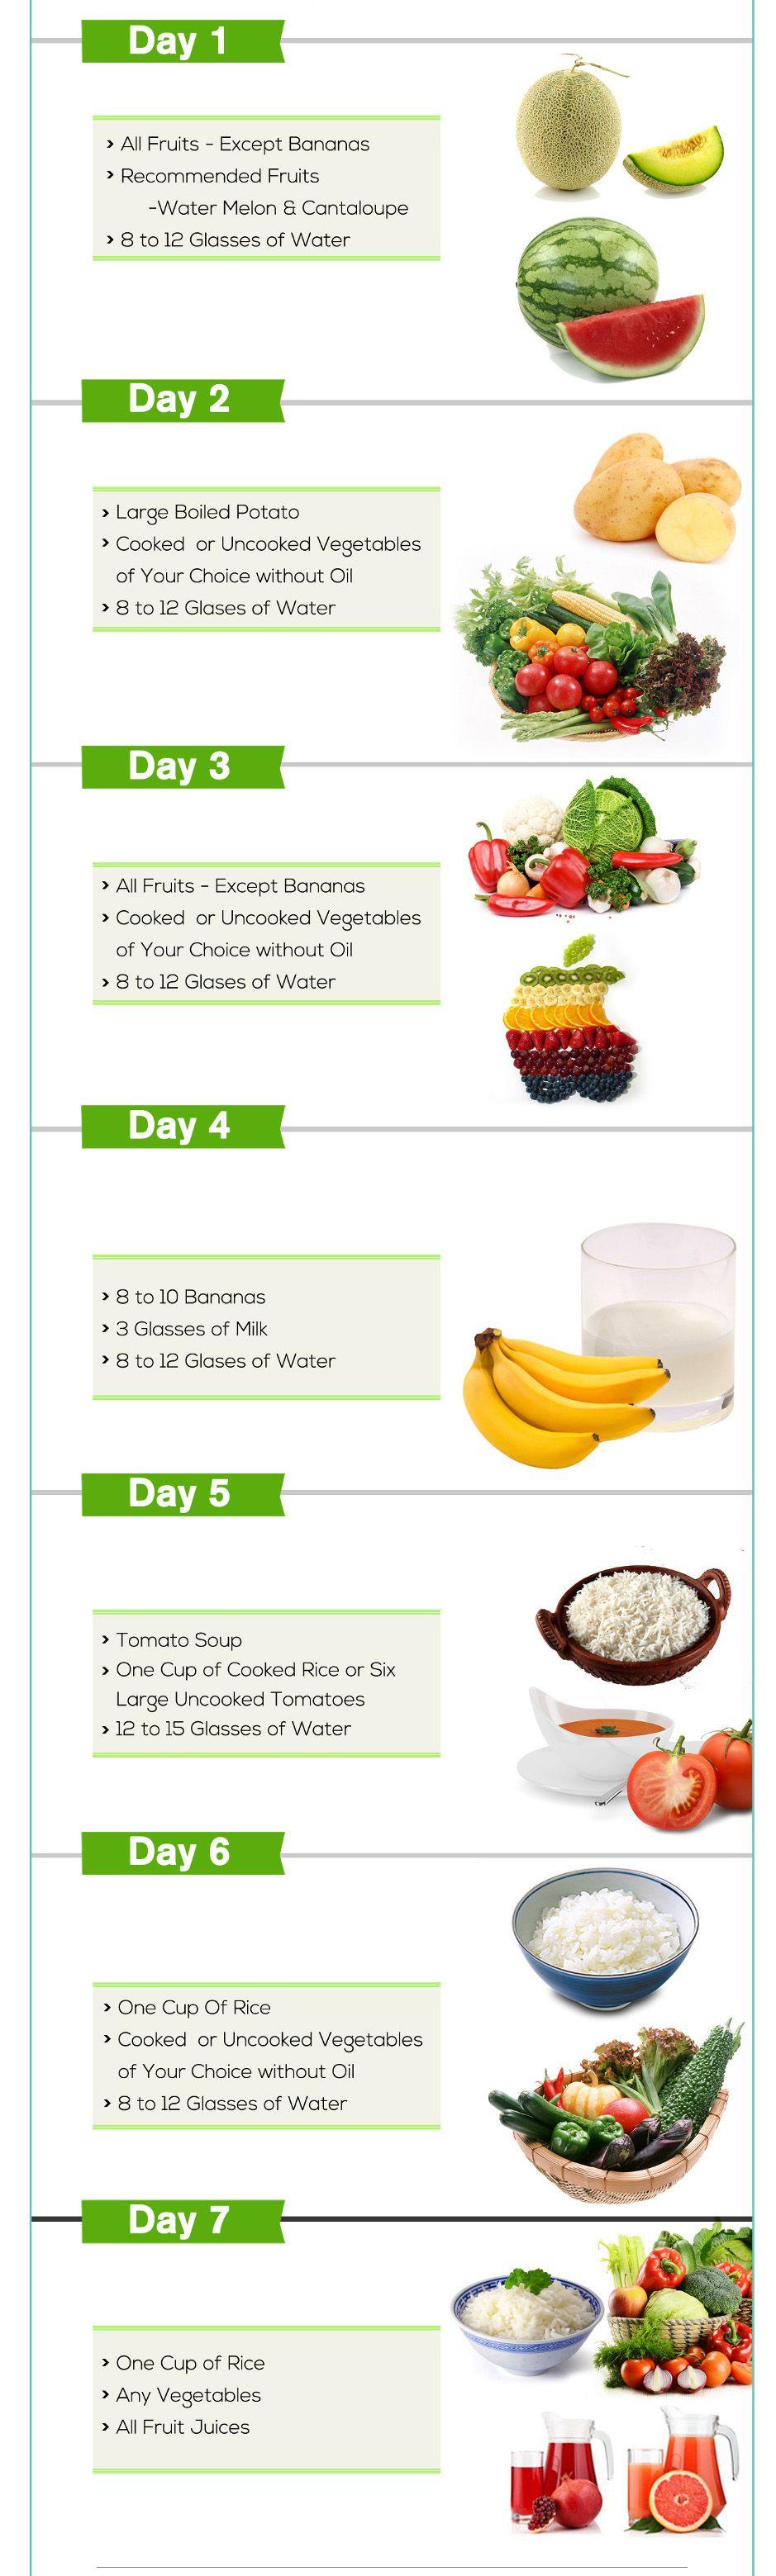 vegetarian diet plan for 7 days | pretend meat | Pinterest | Detox, Diet snacks and Portion sizes